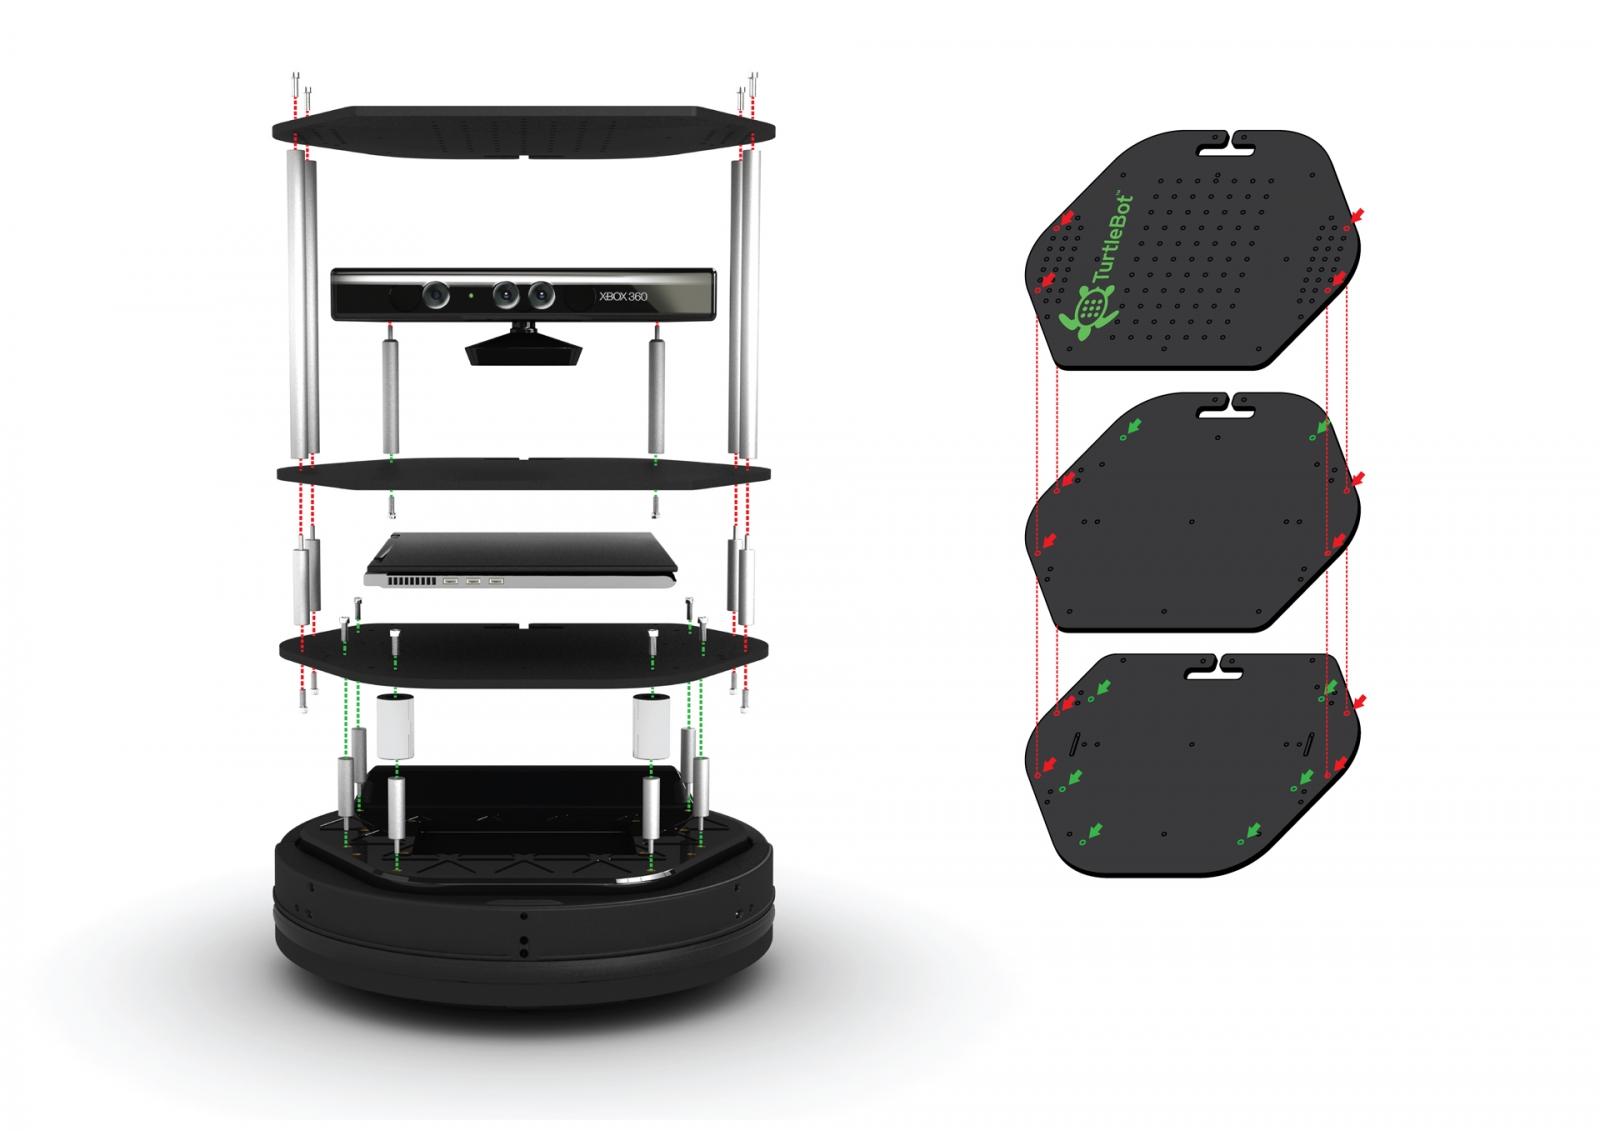 TurtleBot 2 (complete & assembly) - TURTLEBOT